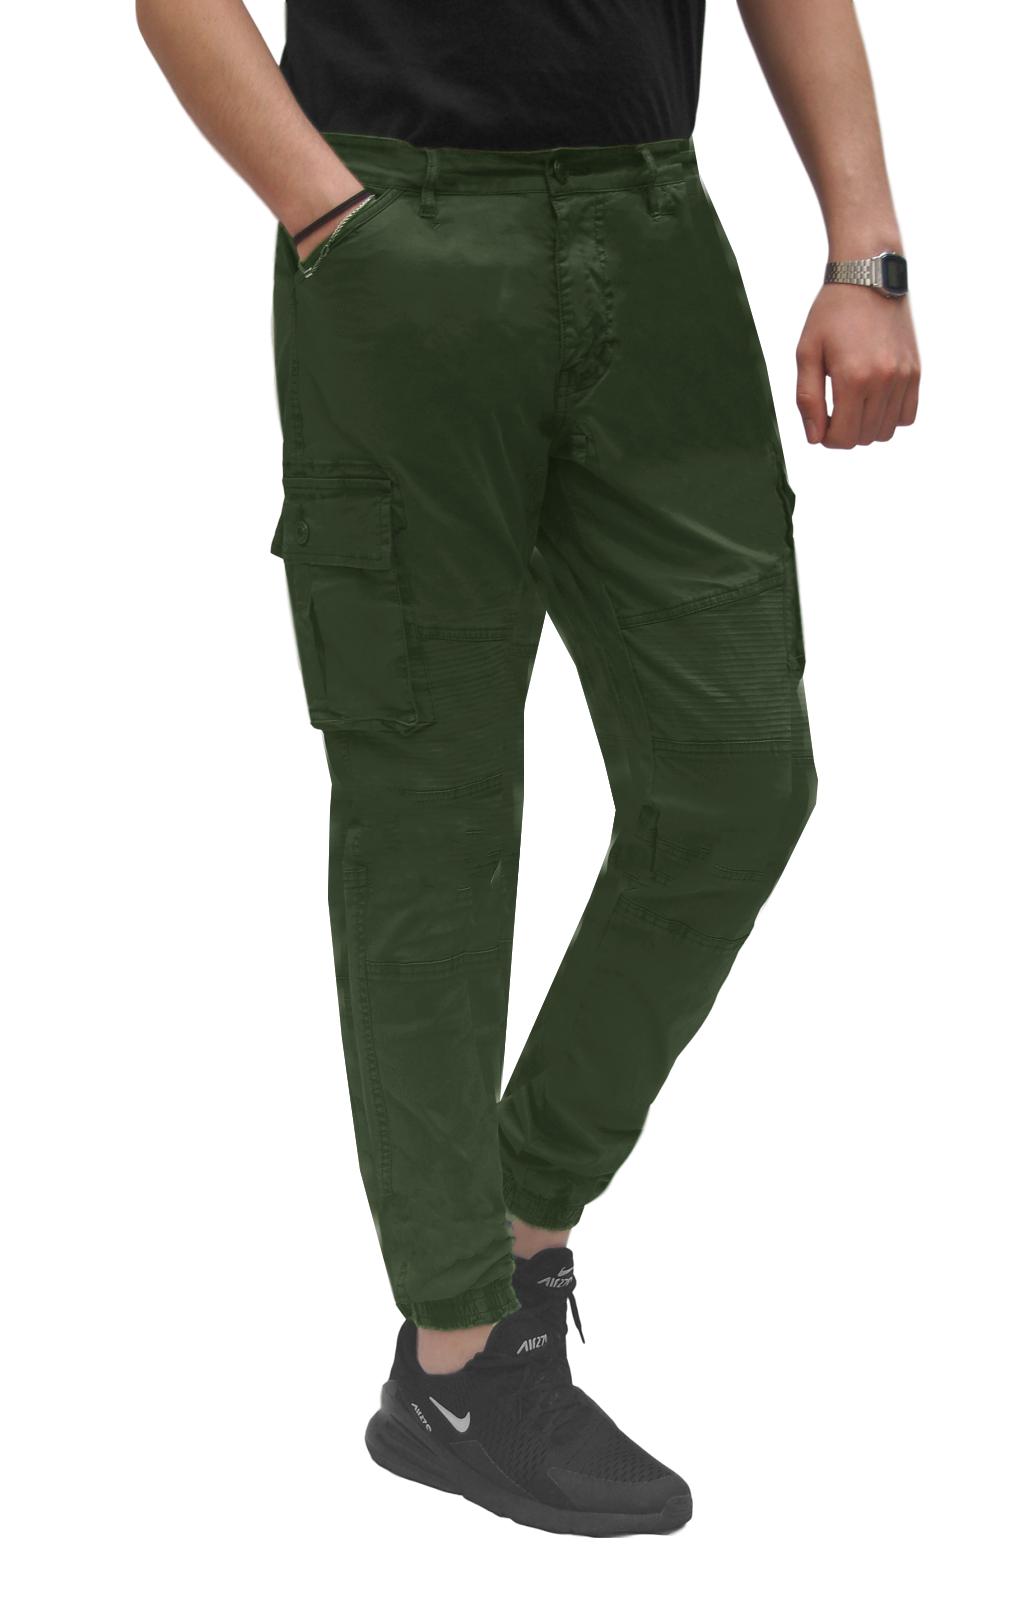 Pantalone-Uomo-Cargo-Con-Tasconi-Invernale-Verde-Blu-Nero-Marrone-Pantaloni-slim miniatura 22